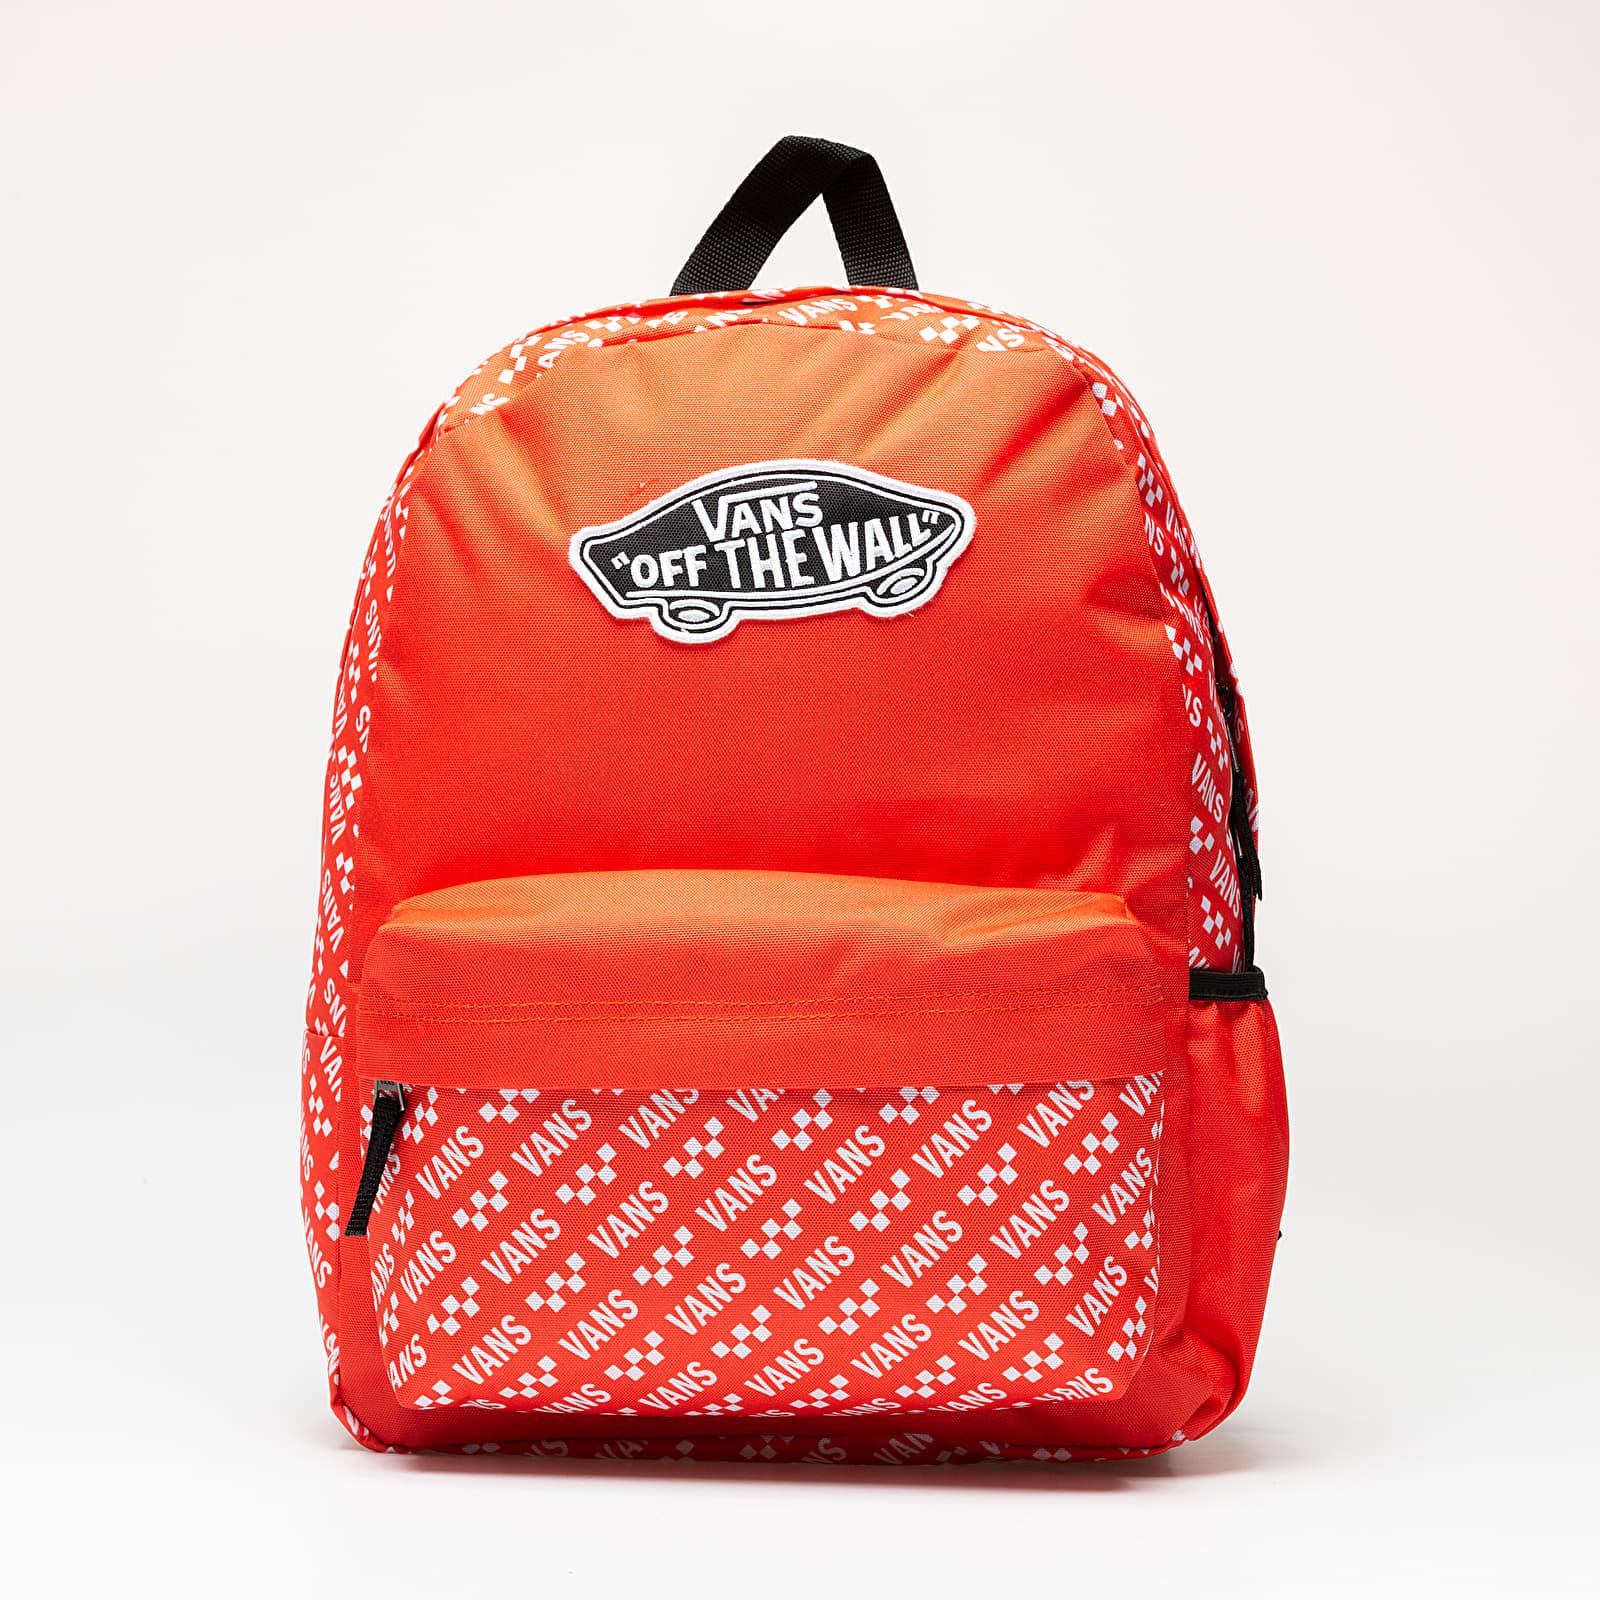 cuestionario Presentador Todo el mundo  Backpacks Vans Street Sport Realm Backpack Grenadine/ Brand